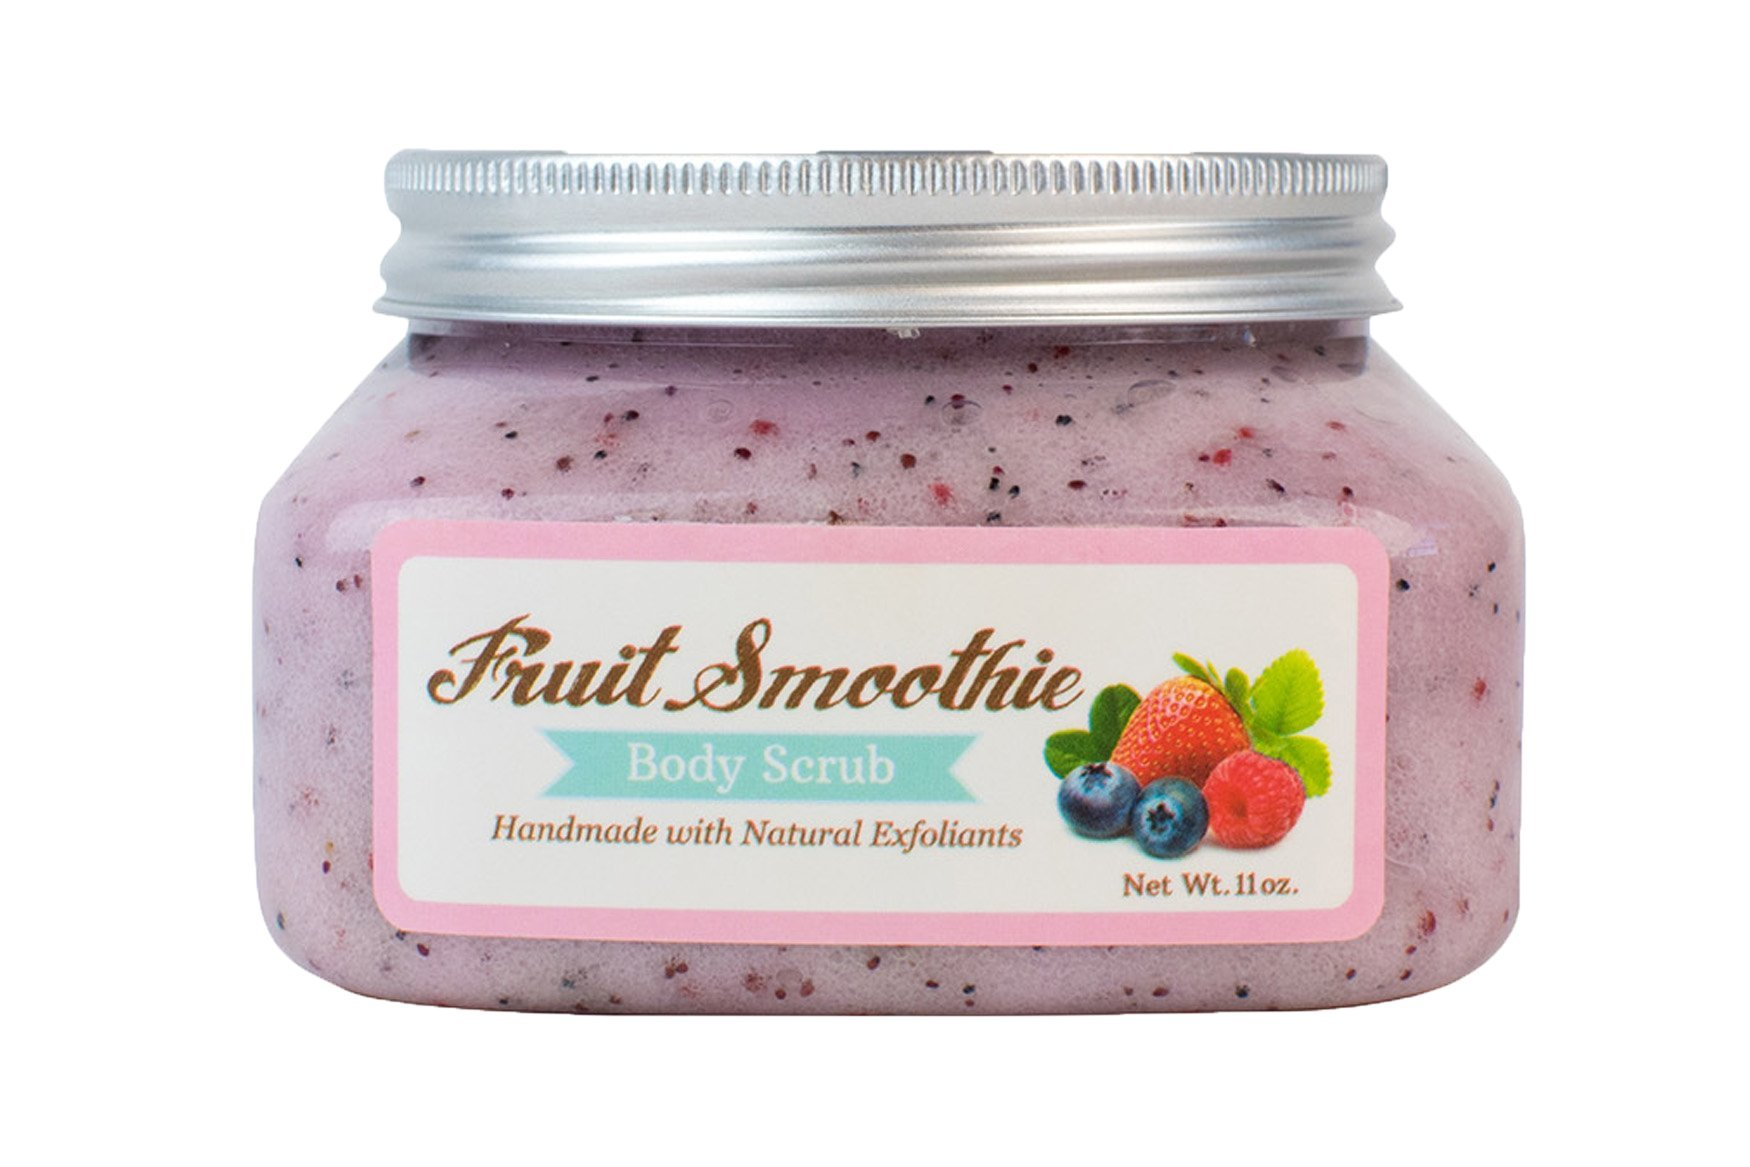 2019 year looks- Hand-made Splurge almond oatmeal scrub review